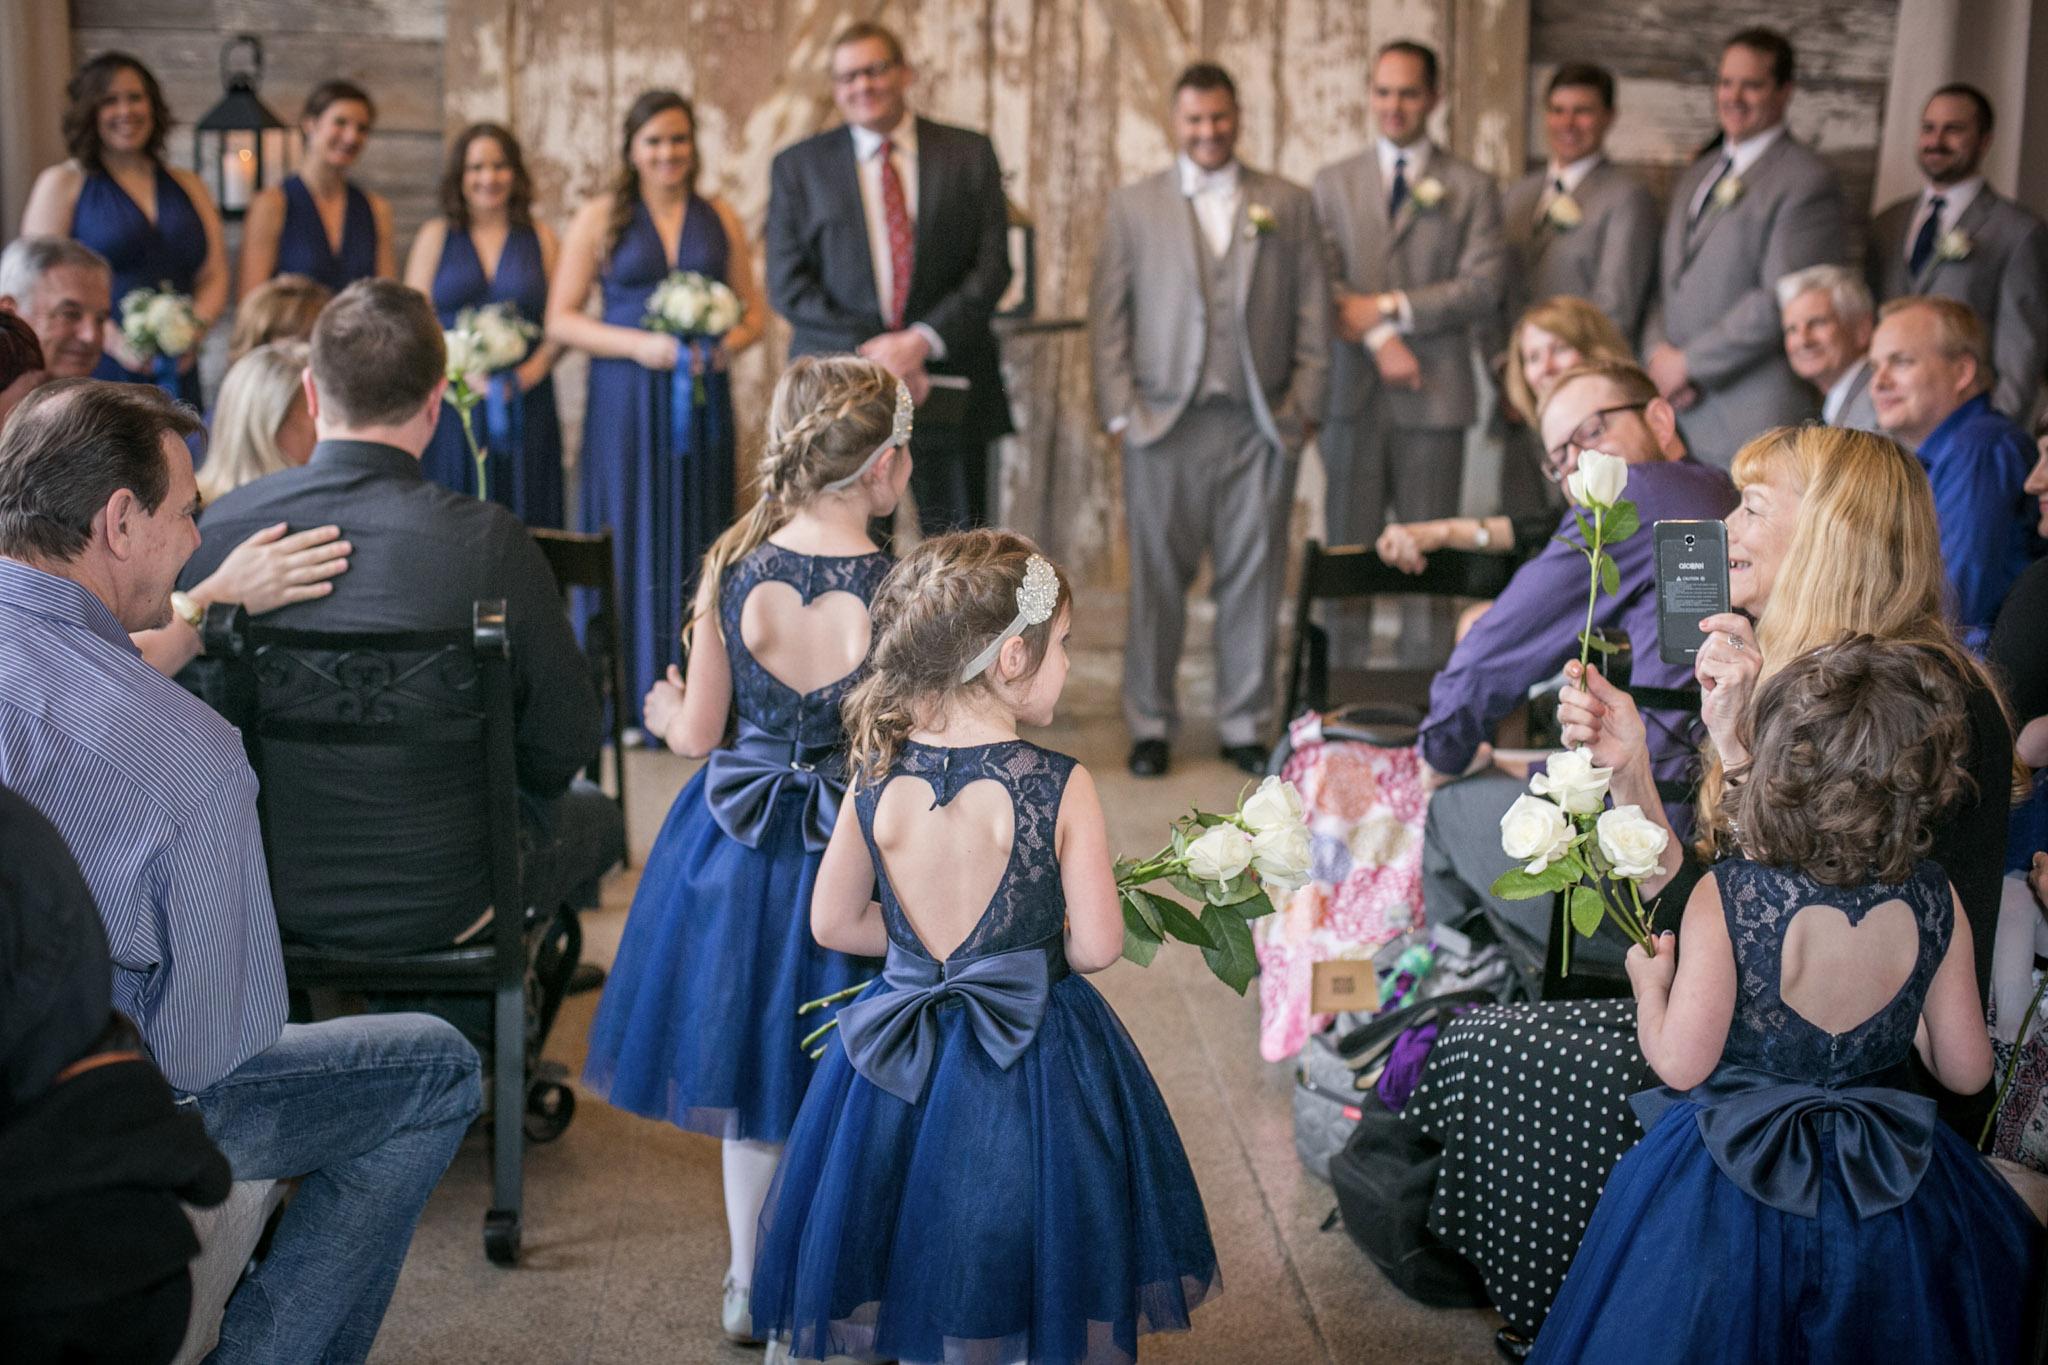 The_Vow_Exchange_Kansas_City_Small_Budget_Wedding_Venue_Andrea&Jon-064.jpg